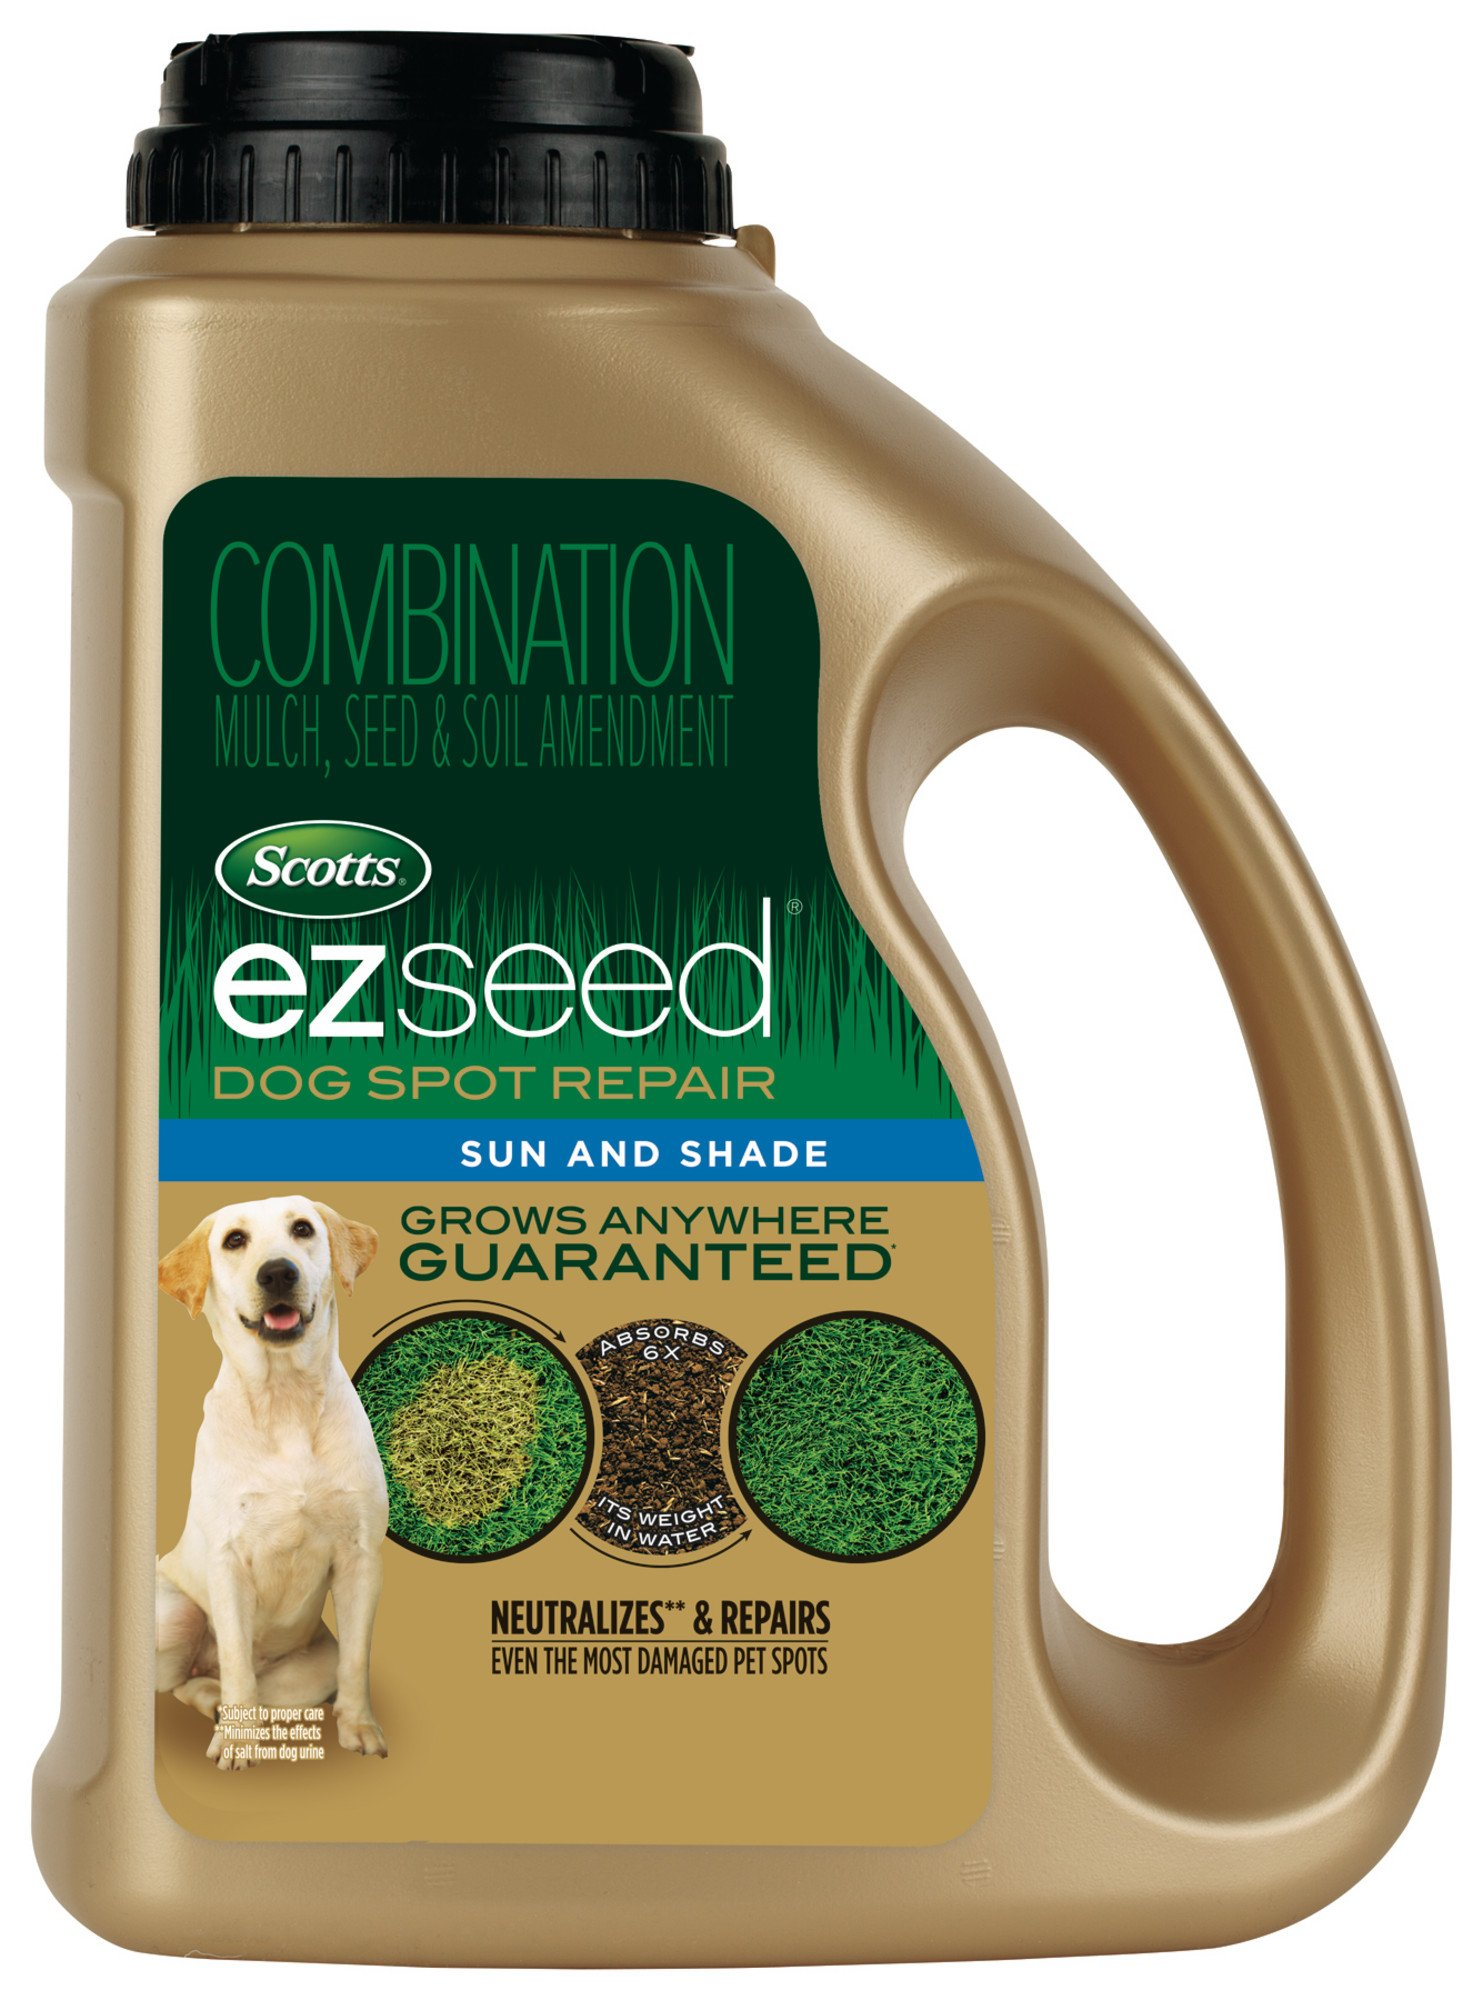 Scotts EZ Seed Sun & Shade 17530 Dog Spot Repair, 2 LB by Scotts